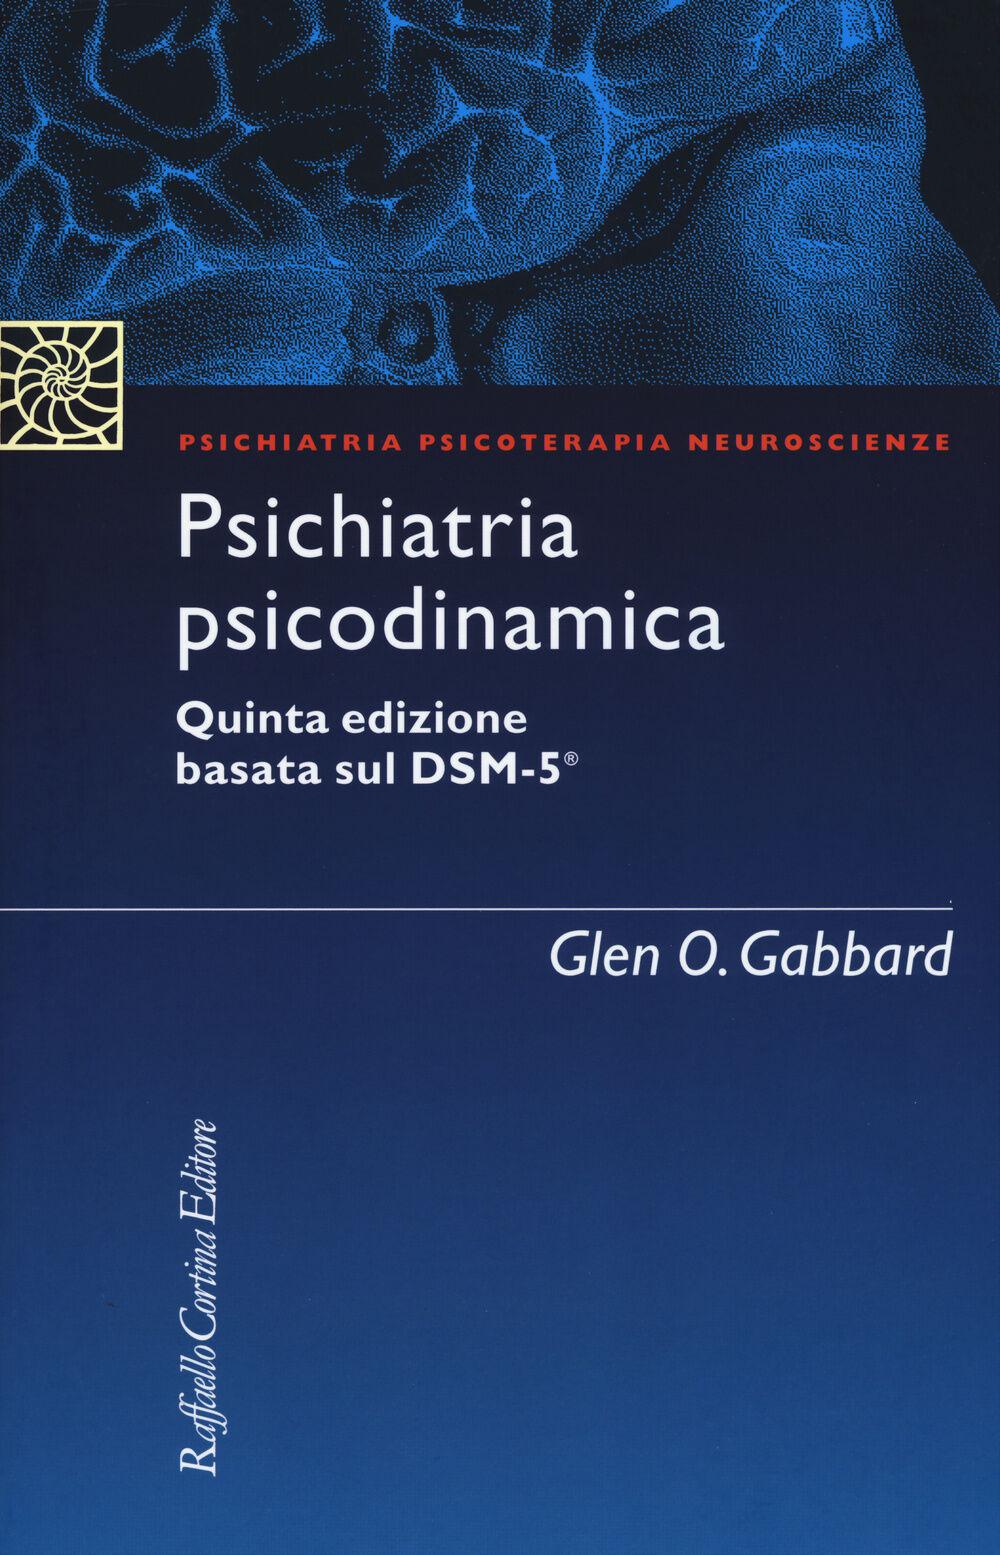 Psichiatria psicodinamica